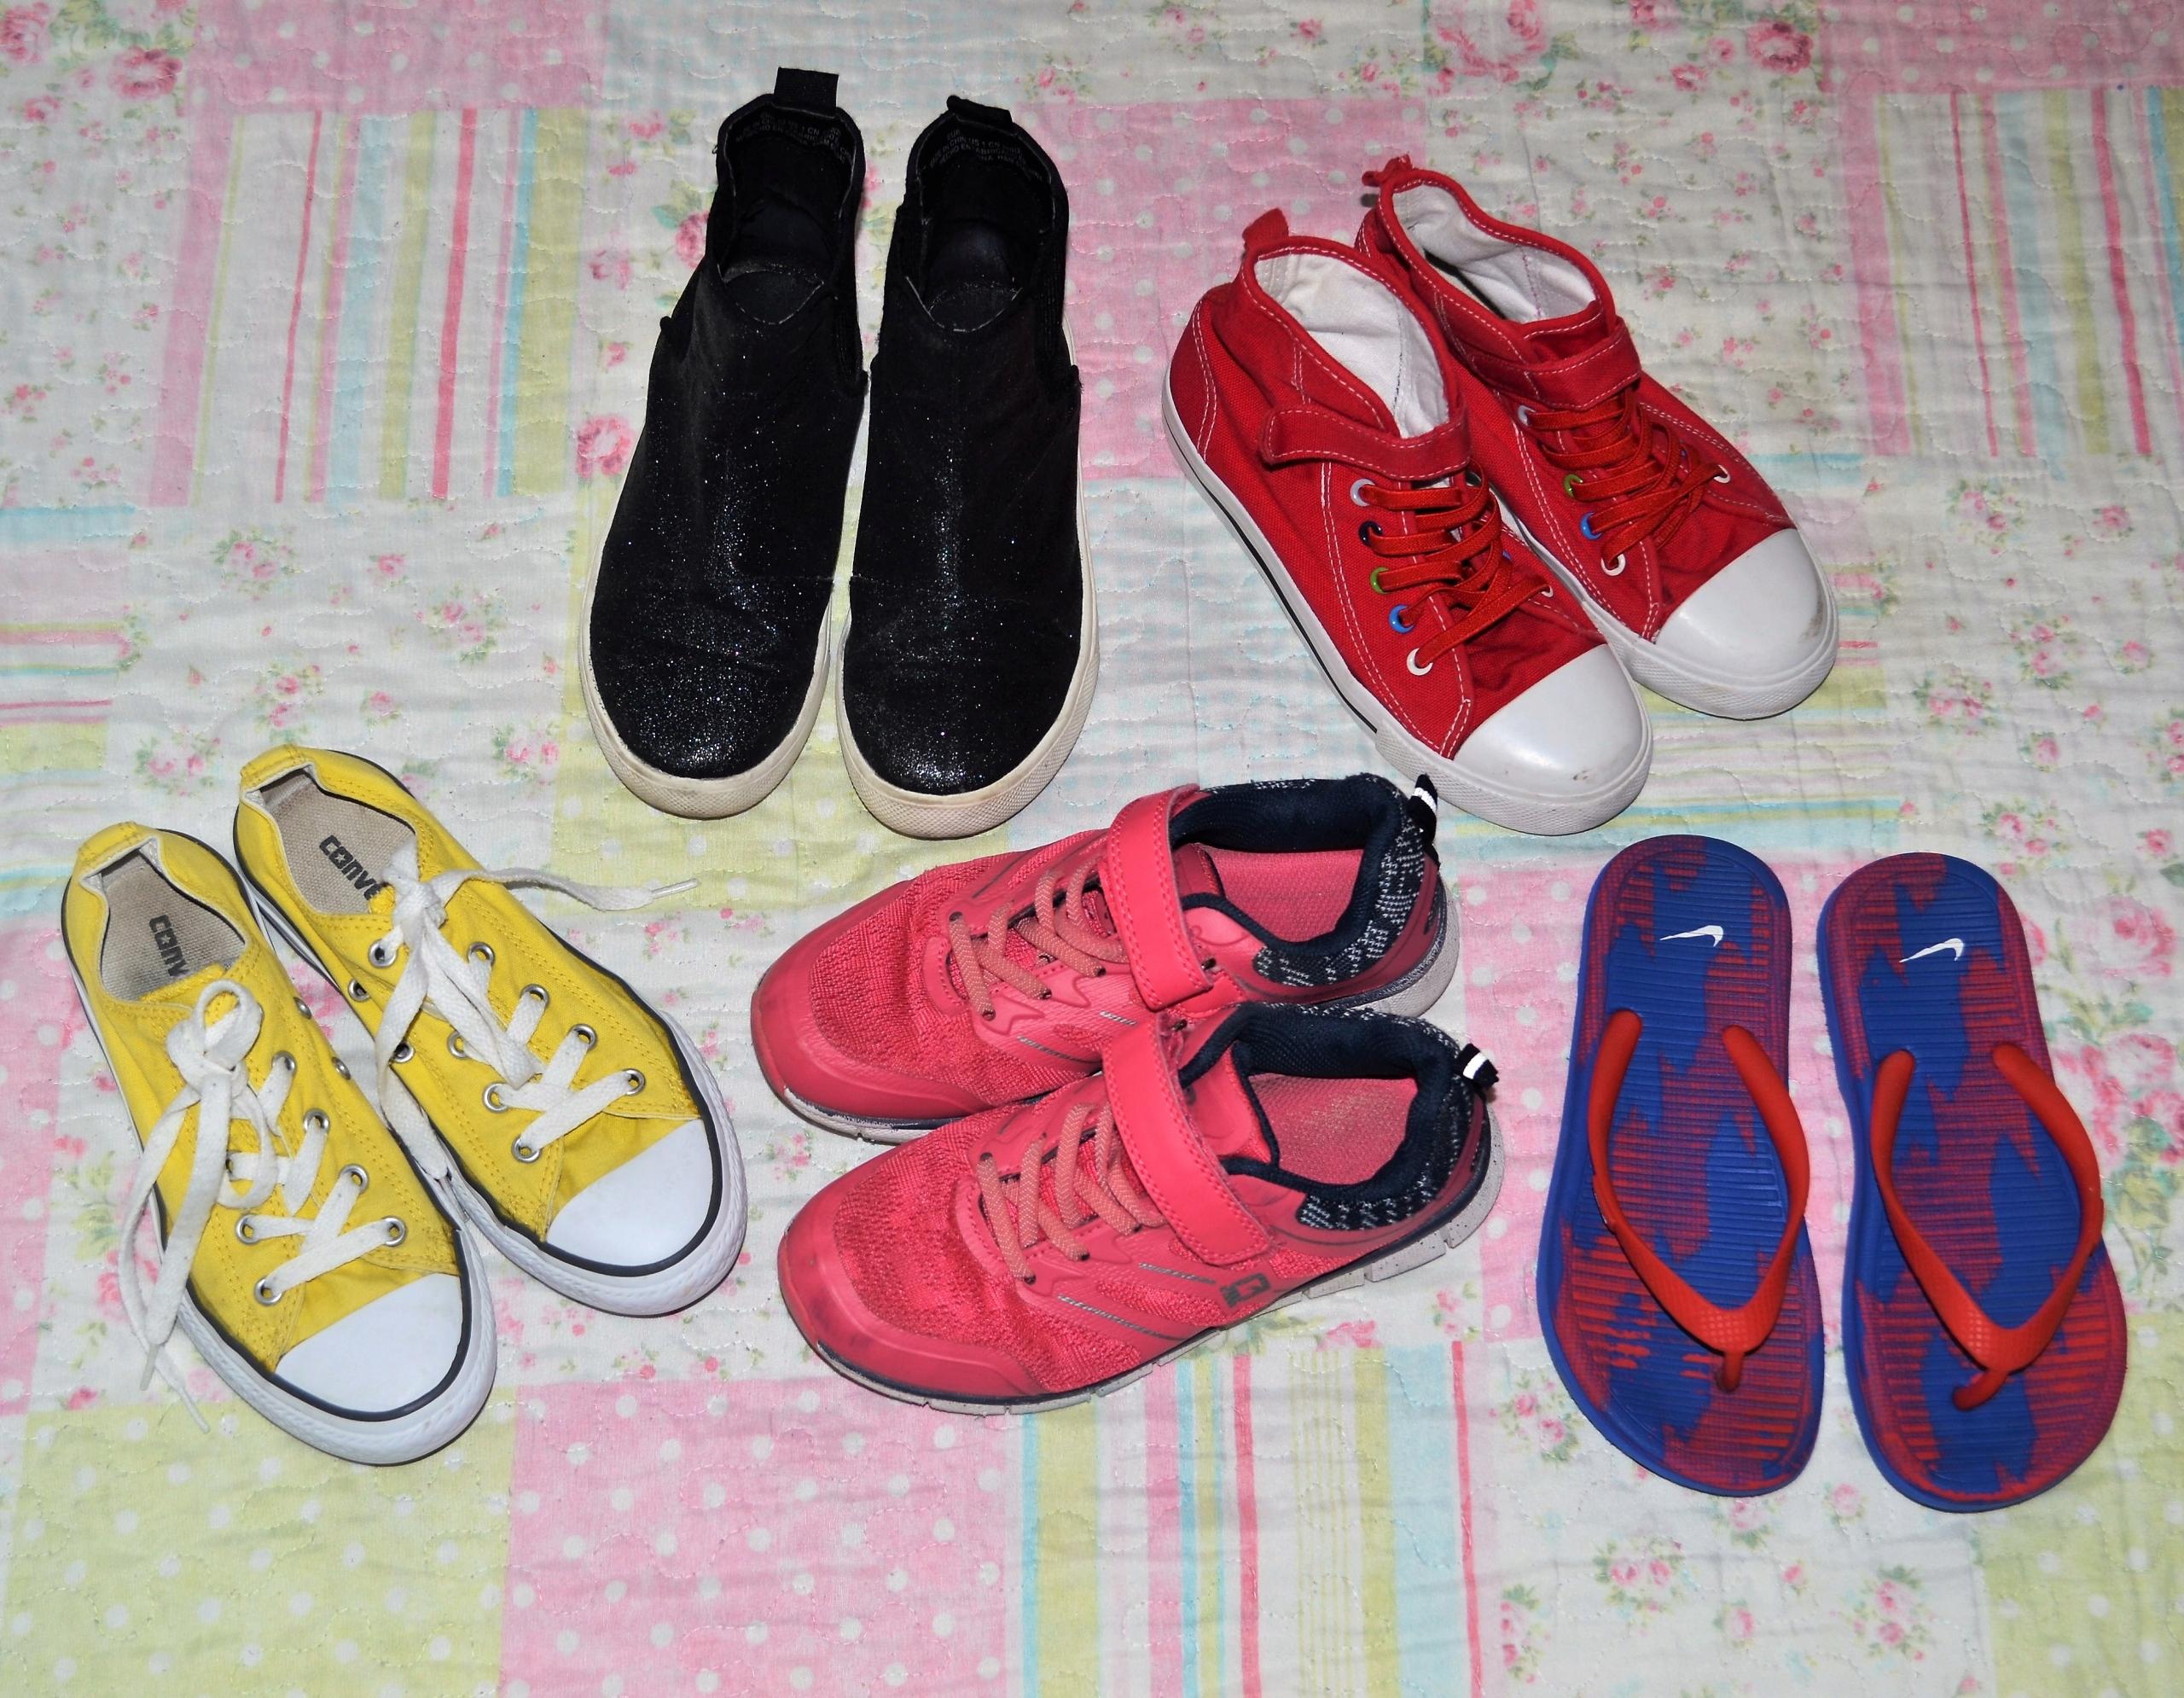 mega zestaw firmowe ubrania buty 128-134 polecam!